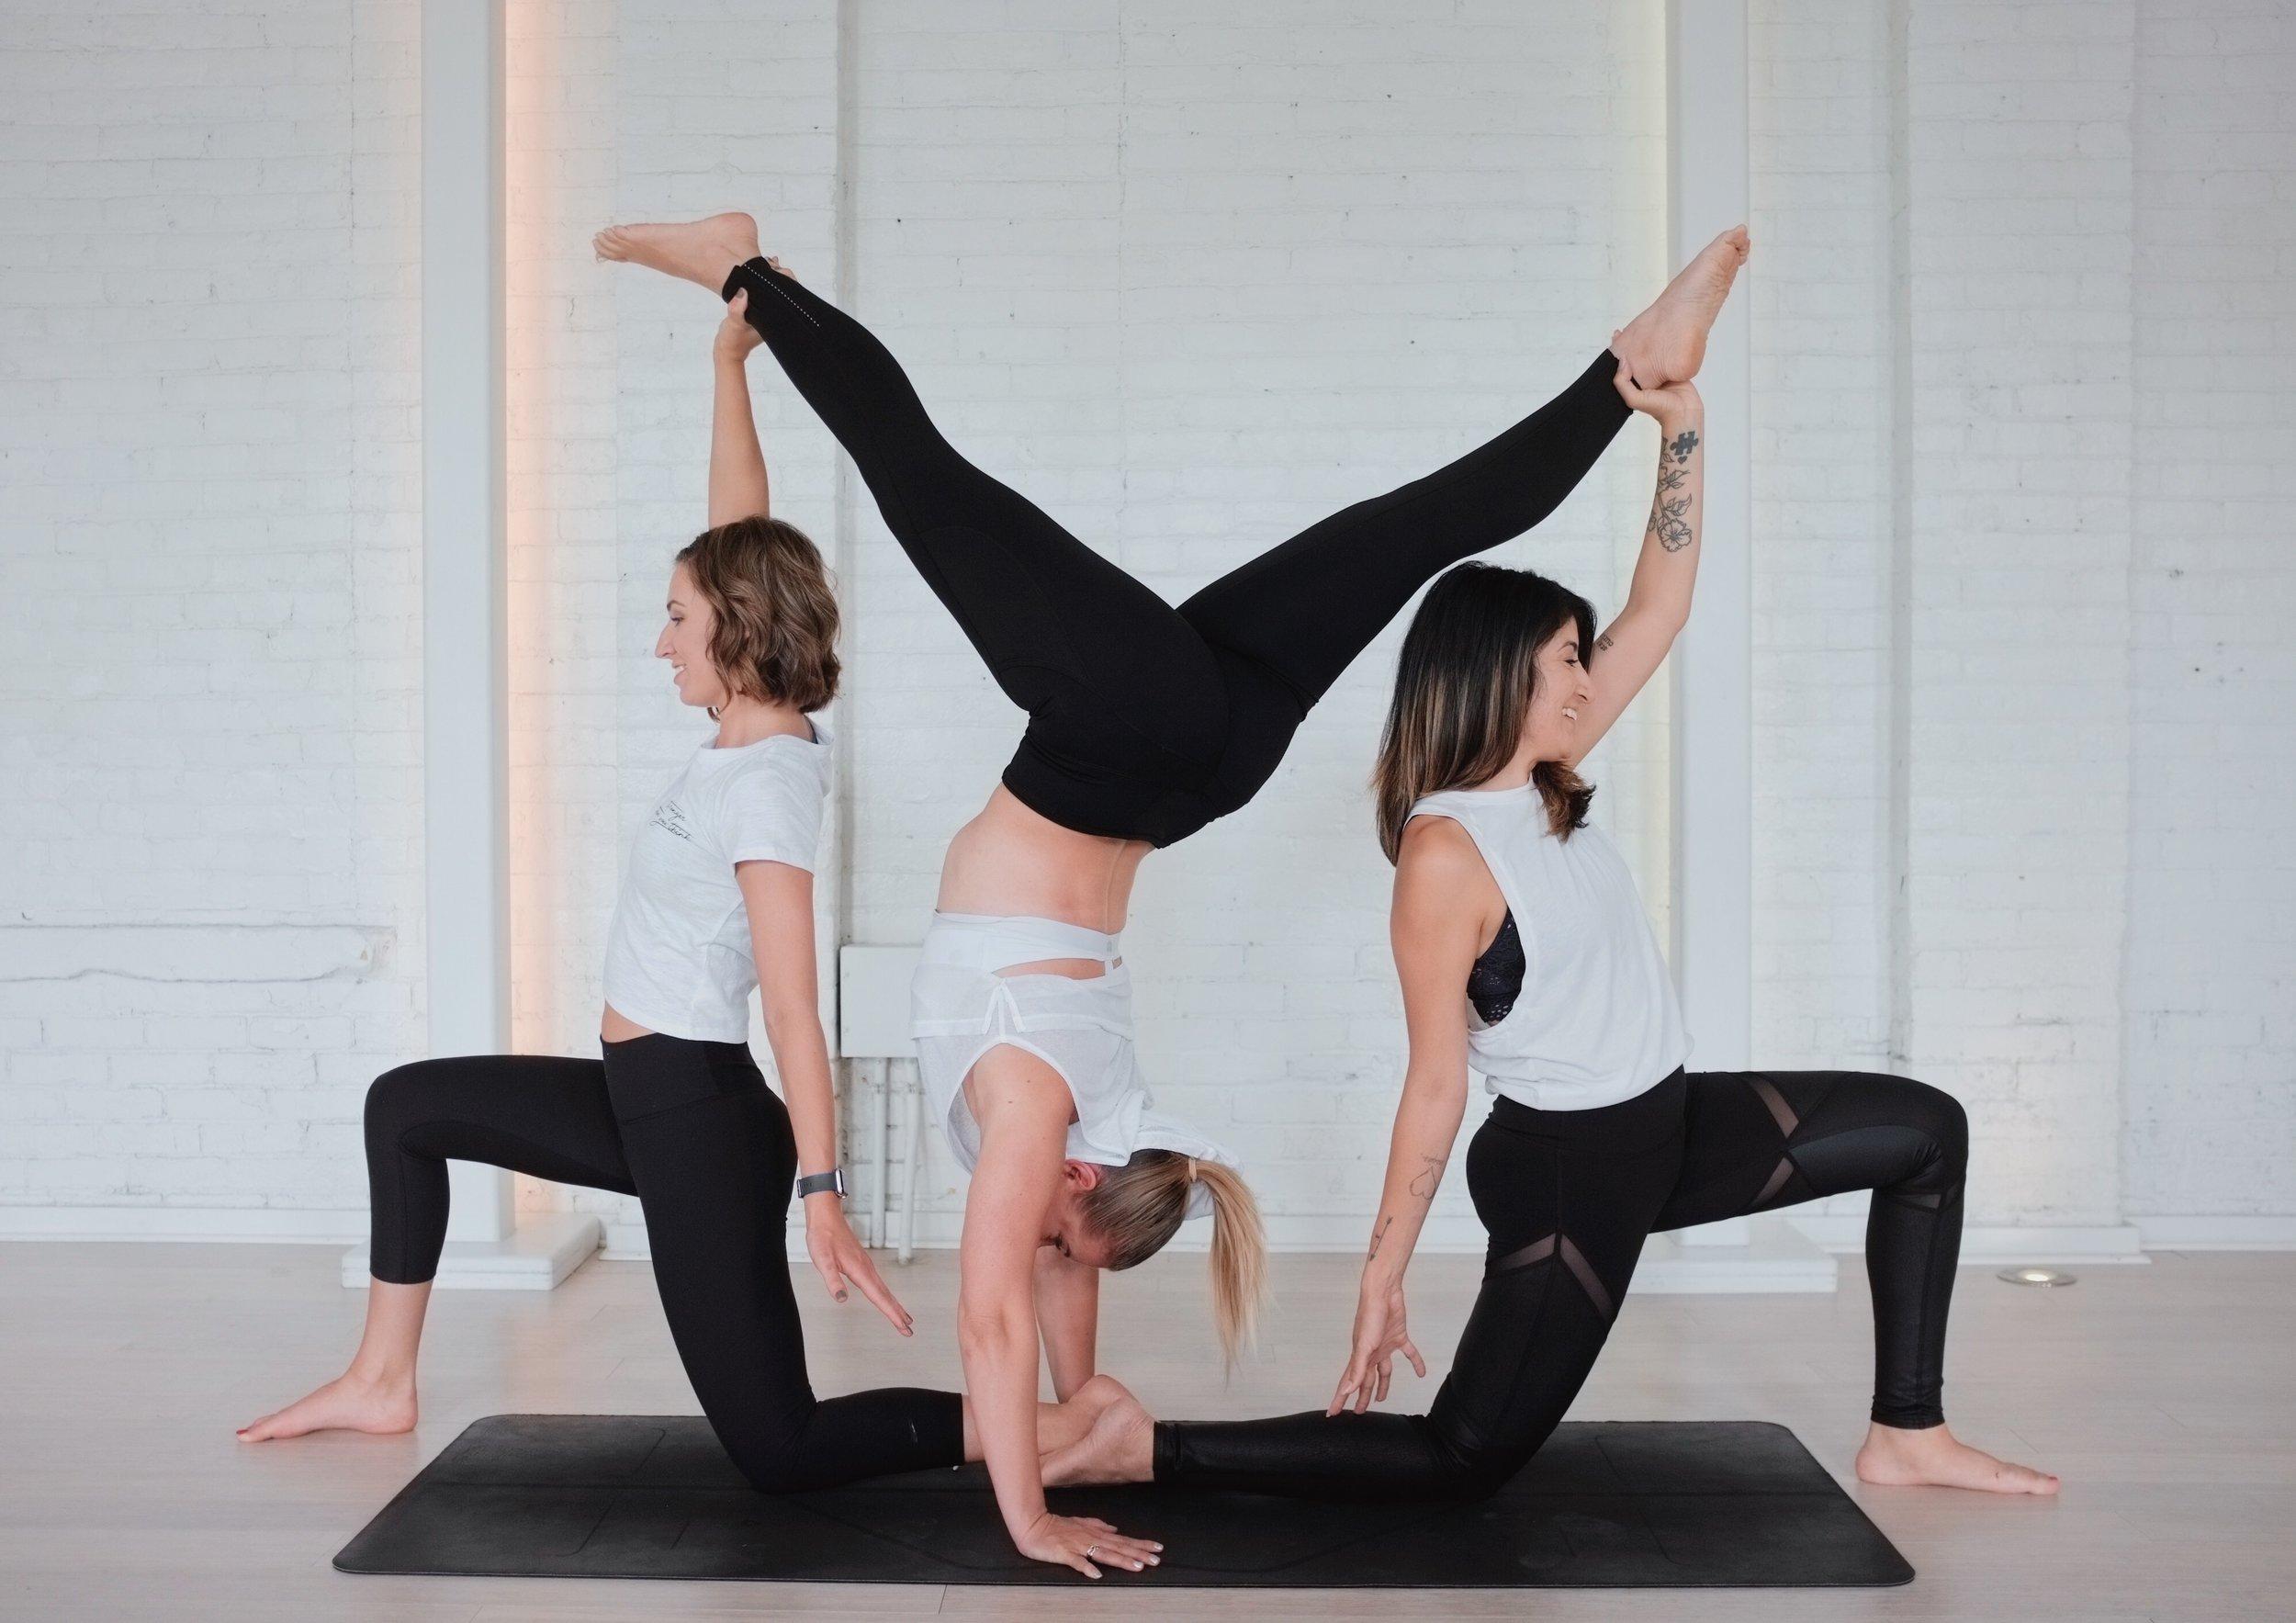 Yoga women's inspiration in Pittsburgh, Pennsylvania.